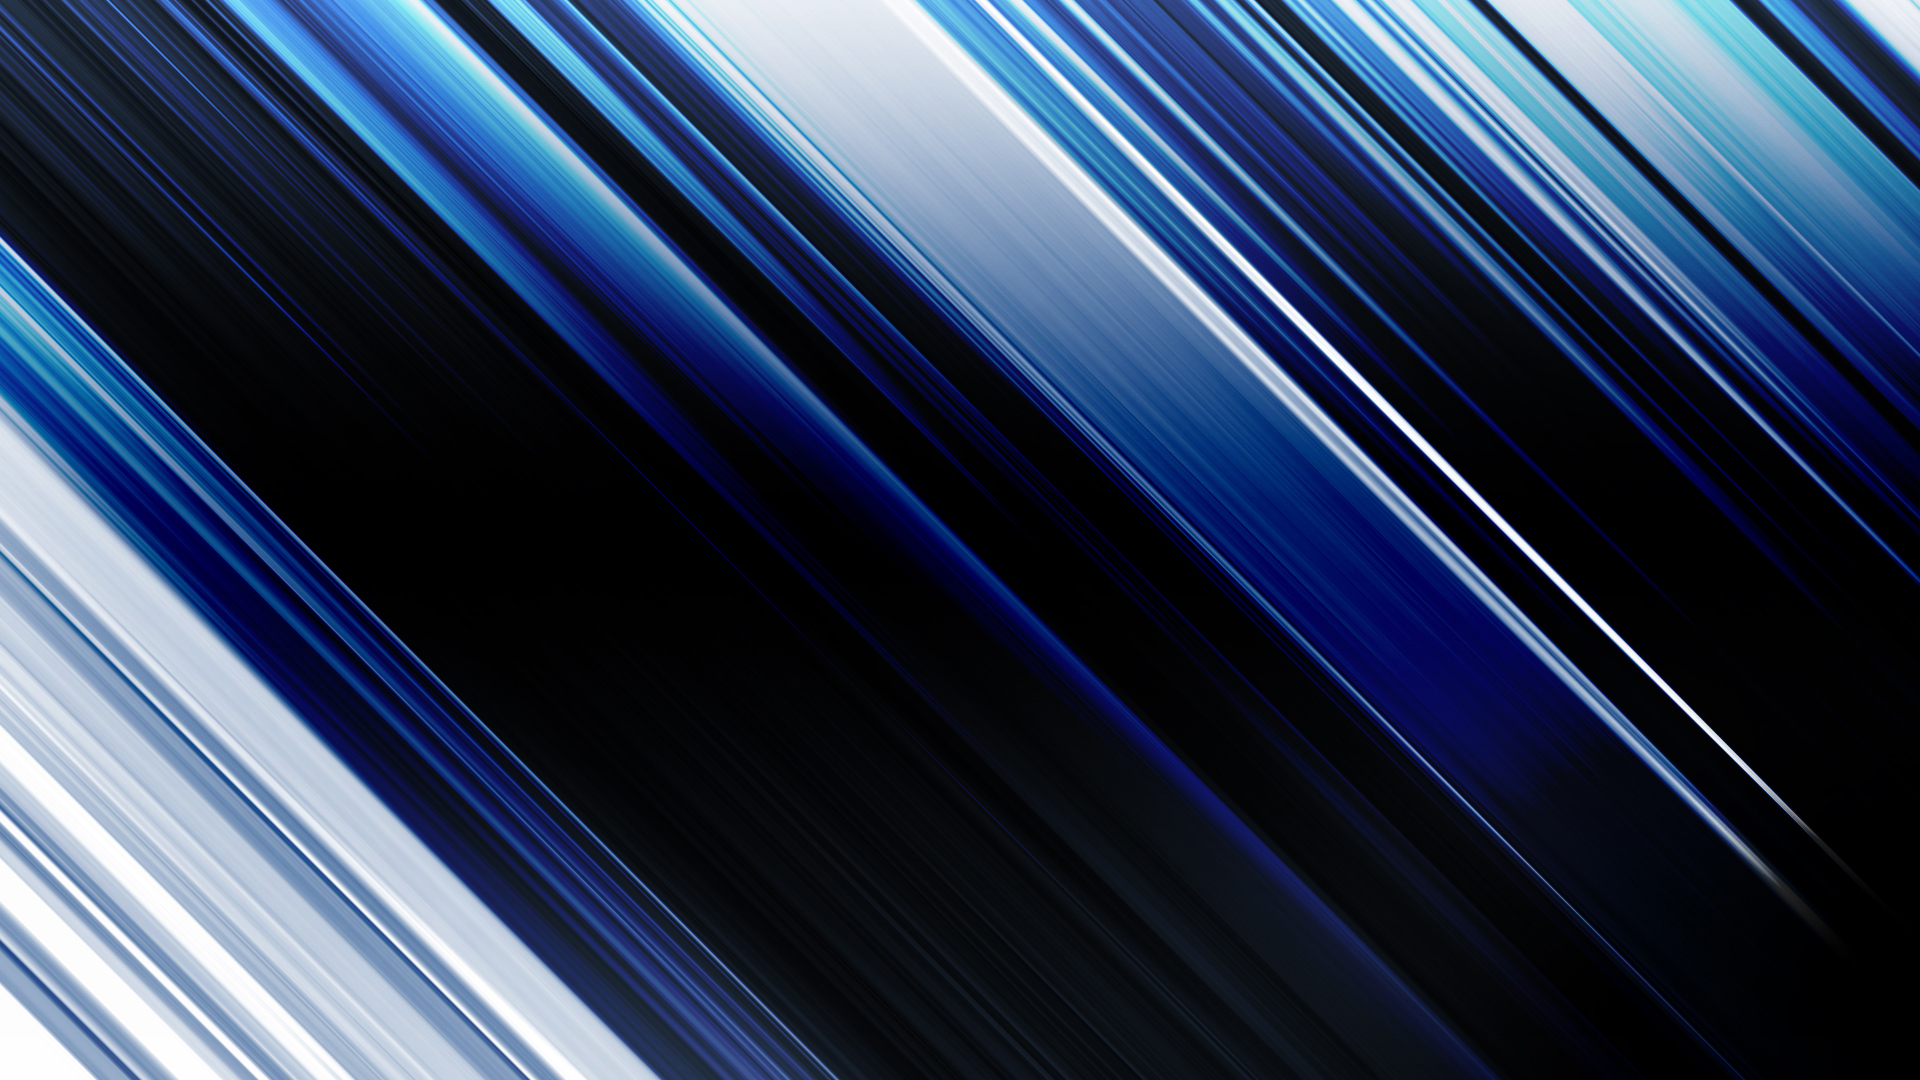 Blue Motion Blur Line Wallpaper 1920x1080 Full HD Wallpapers 1920x1080